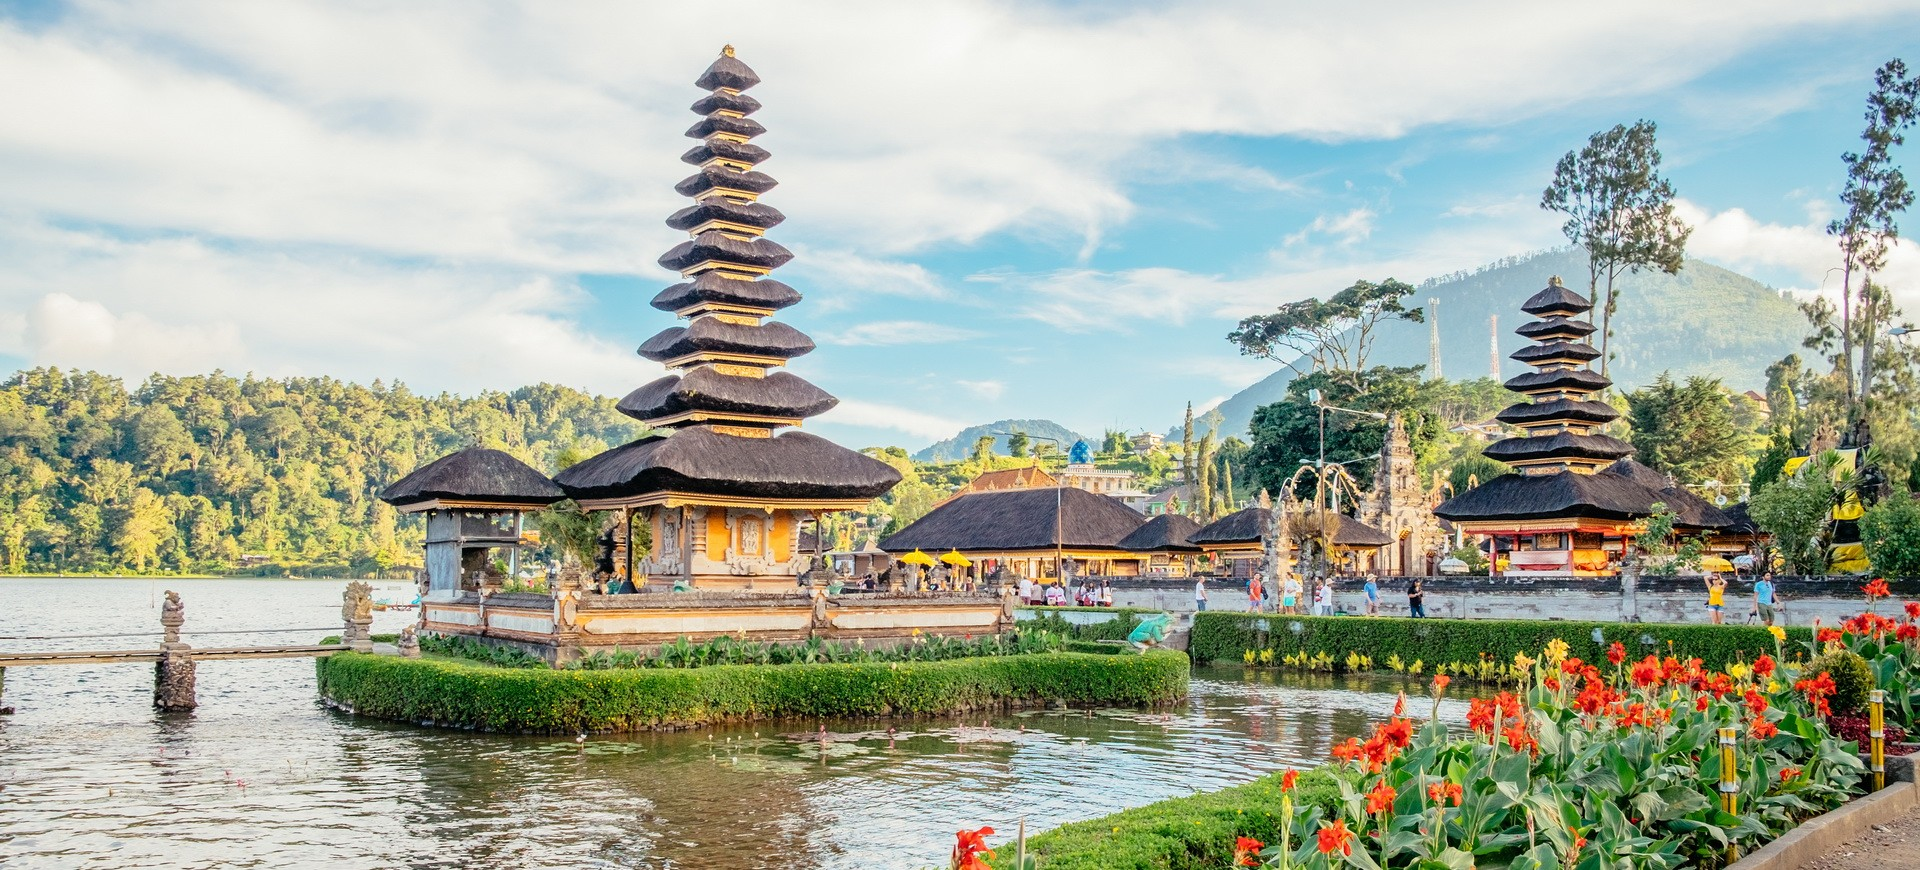 Indonésie Bali Lac Bratan temple Hindou Pura Ulun Danu Bratan